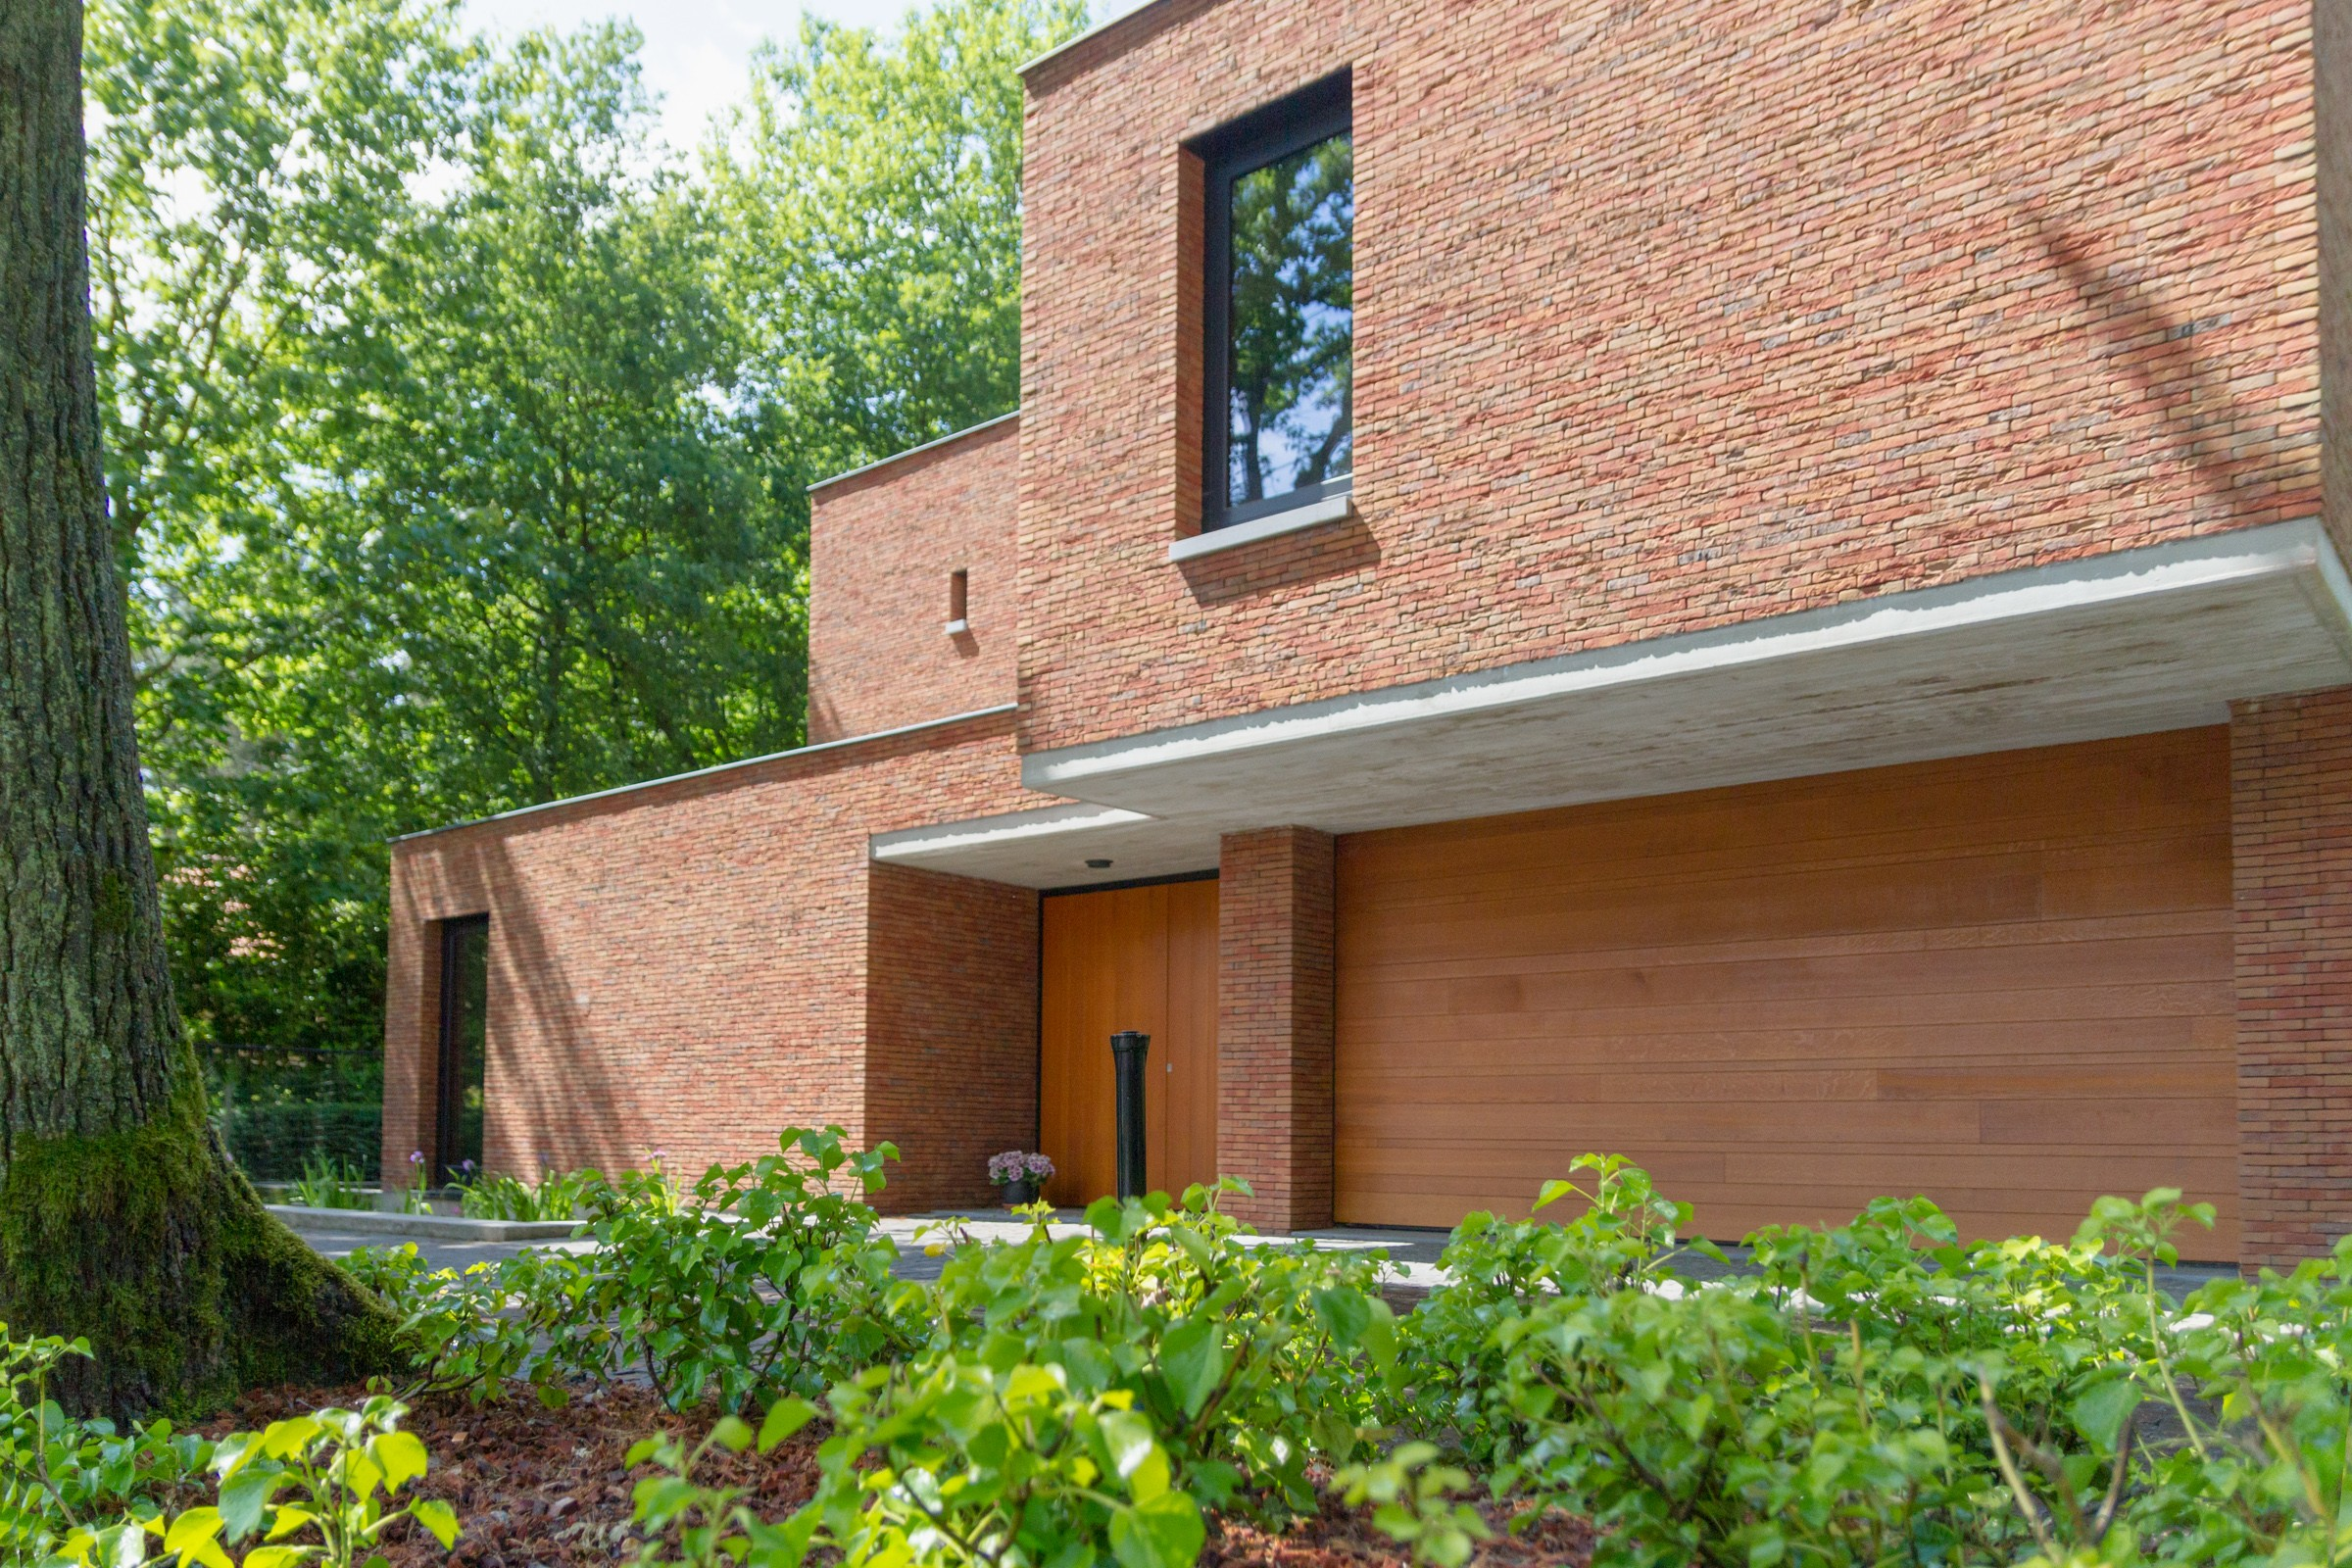 Moderne tuinen archieven tuinen - Te dekken moderne tuin ...